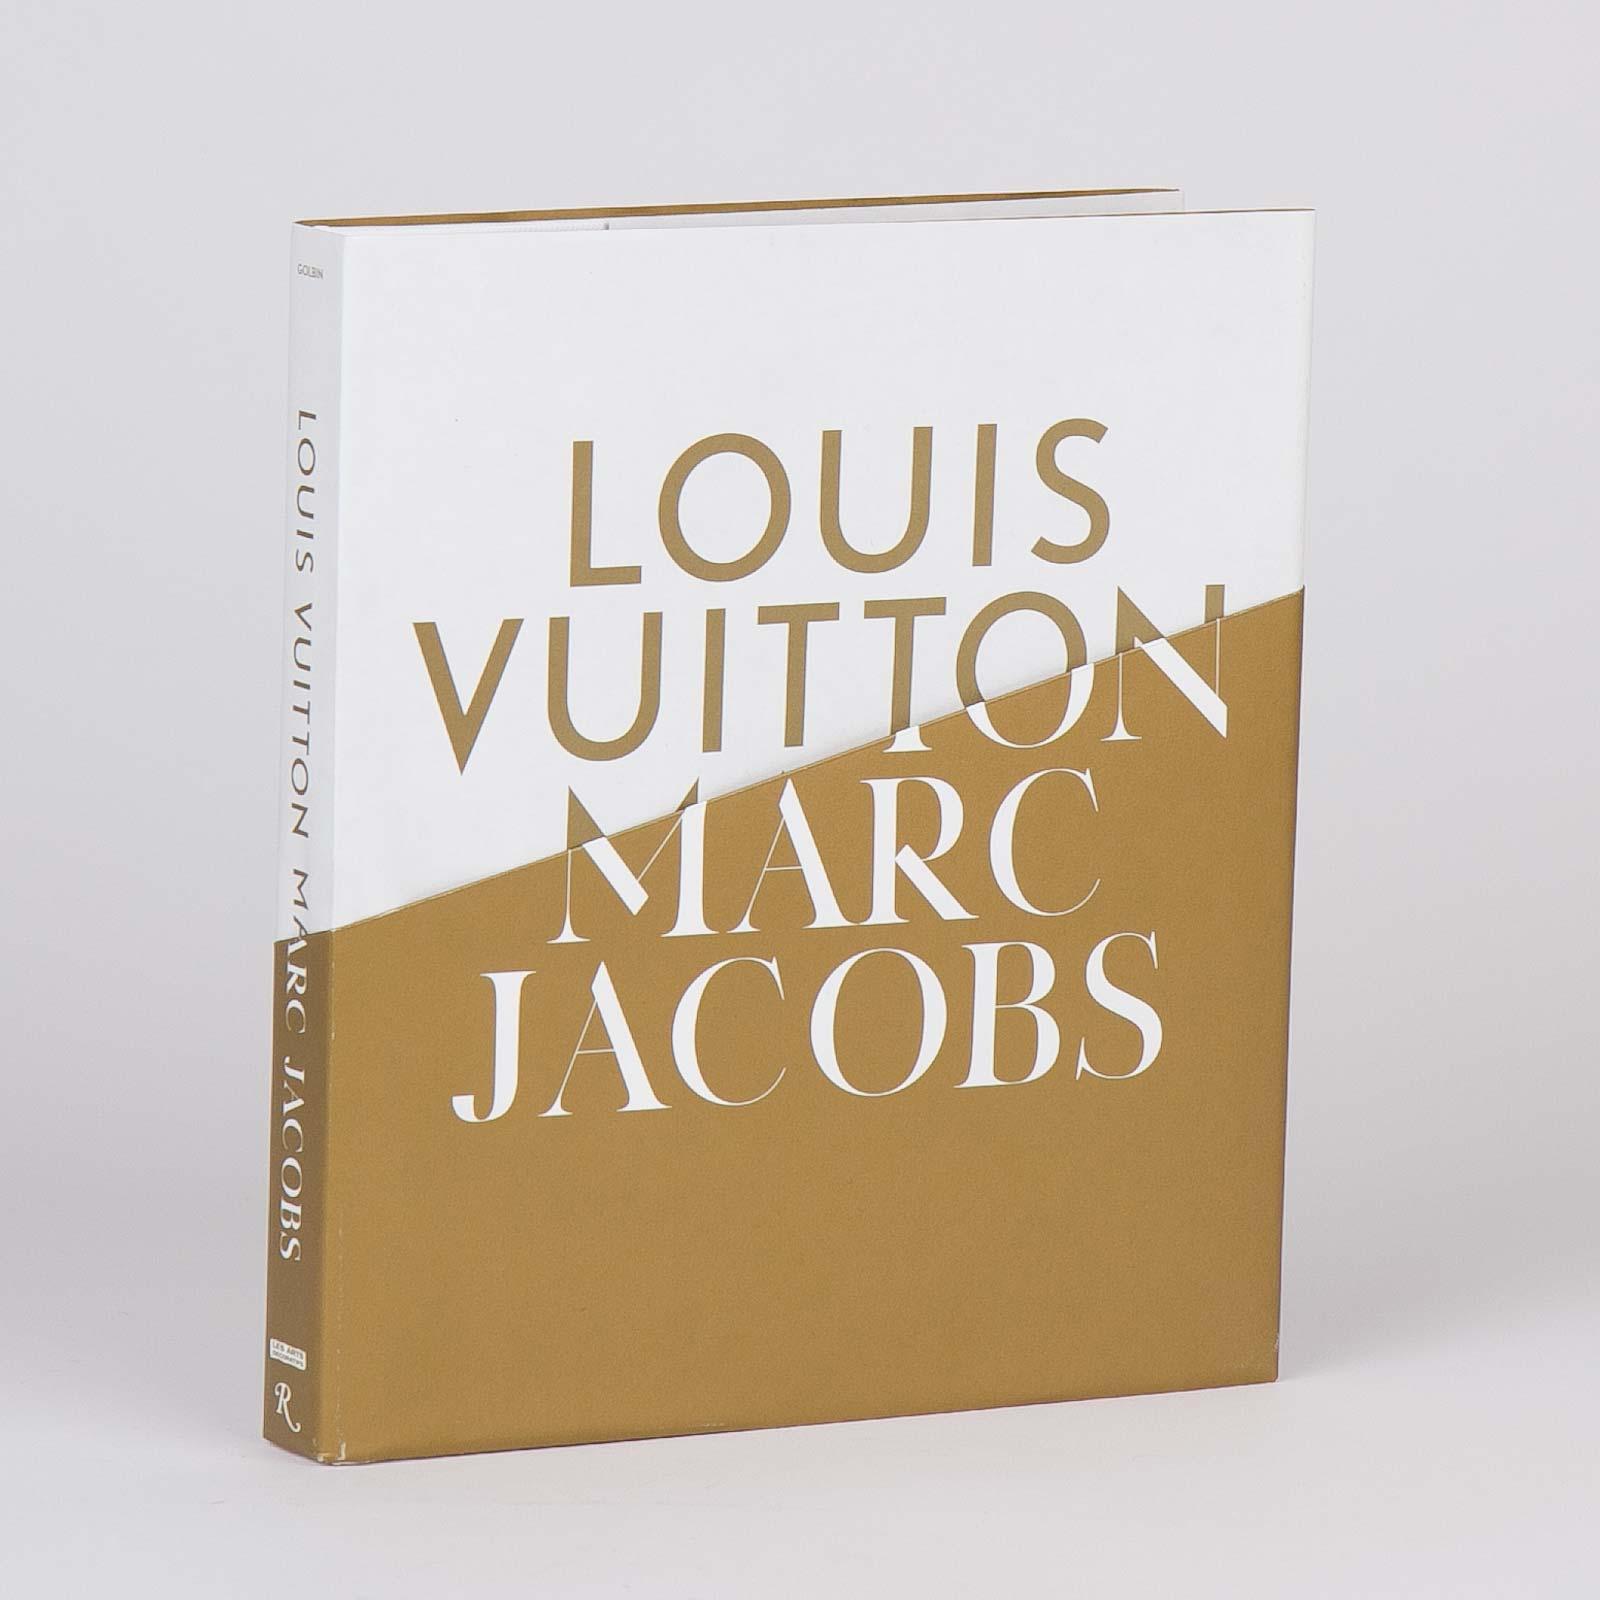 afcceab72559 Books Louis Vuitton Marc Jacobs - Rizzoli-LV-MarcJacobs-Book ...